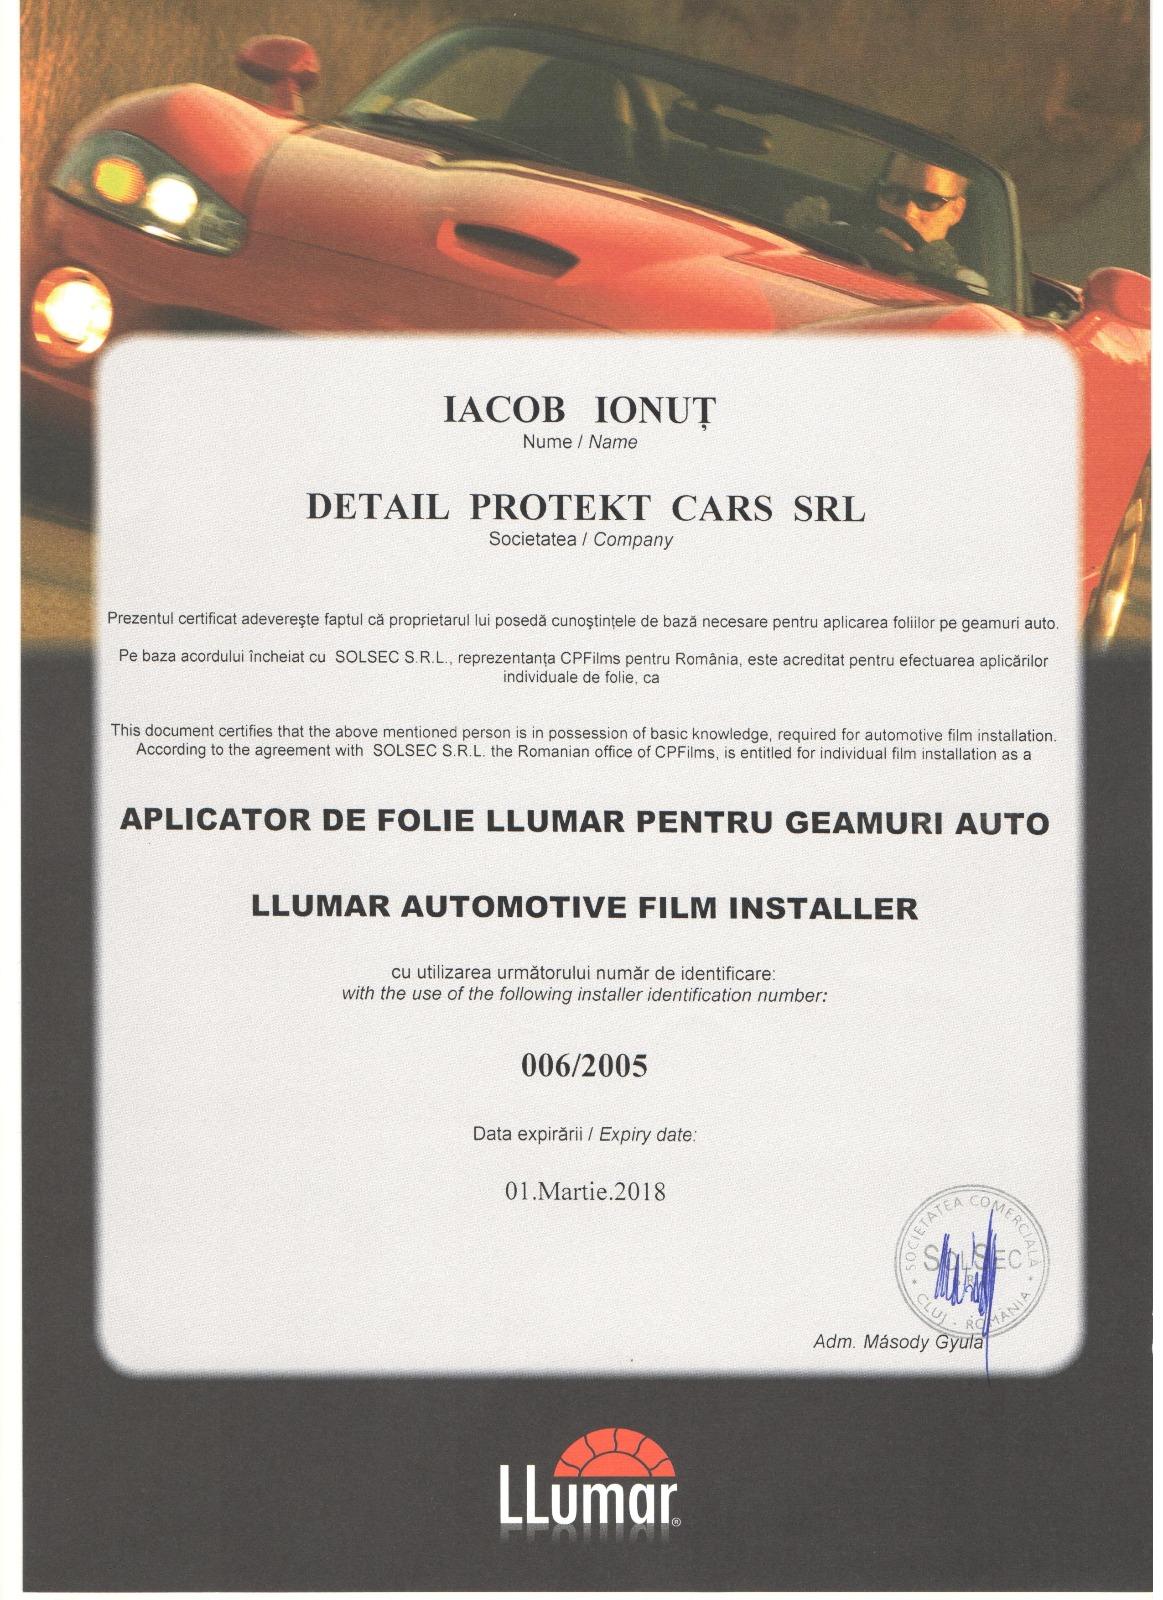 ionut-iacob-aplicator-autorizat-folie-auto